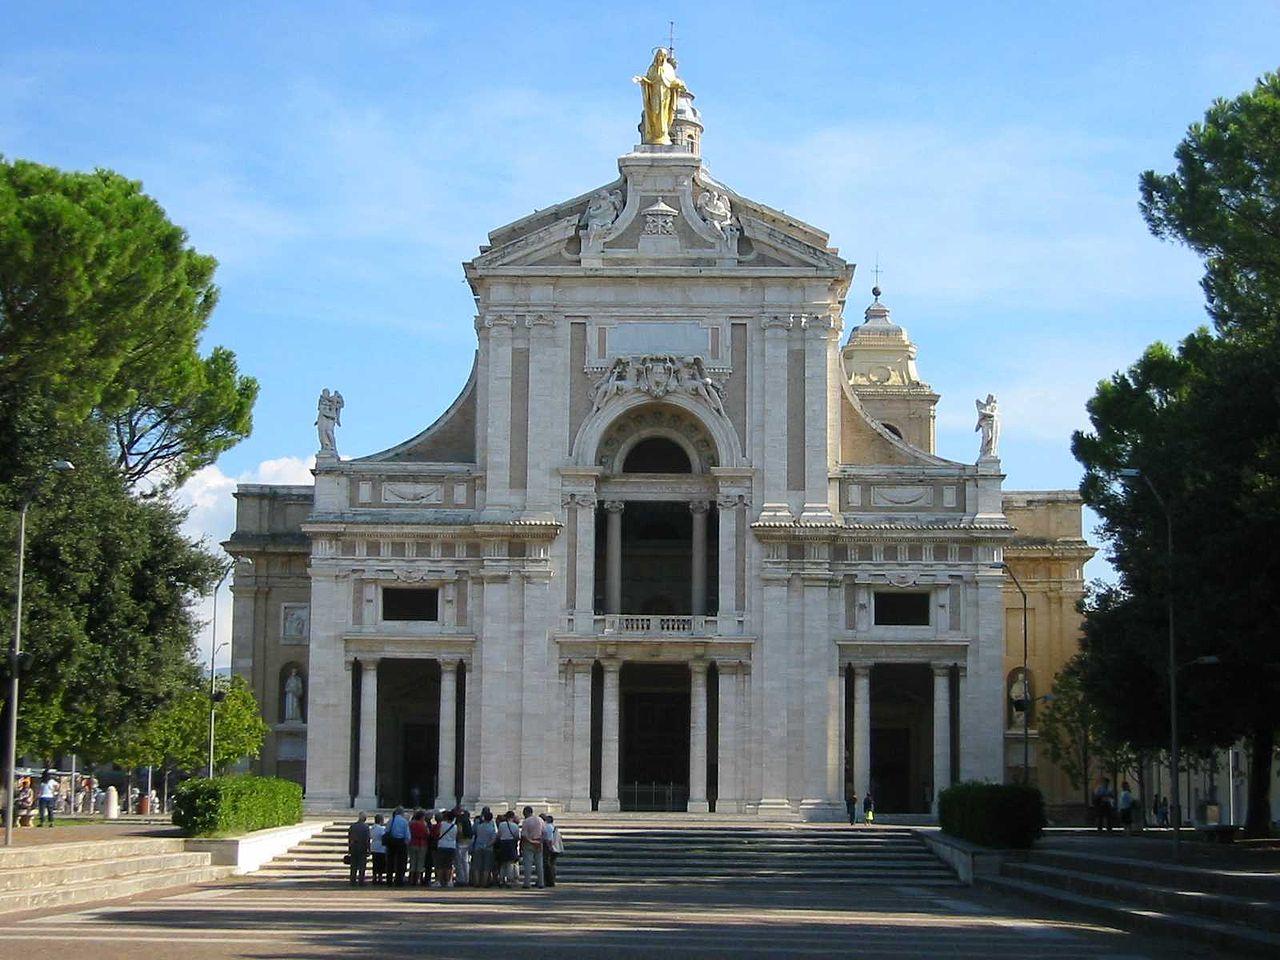 Basilica Santa Maria degli Angeli near Assisi. The front